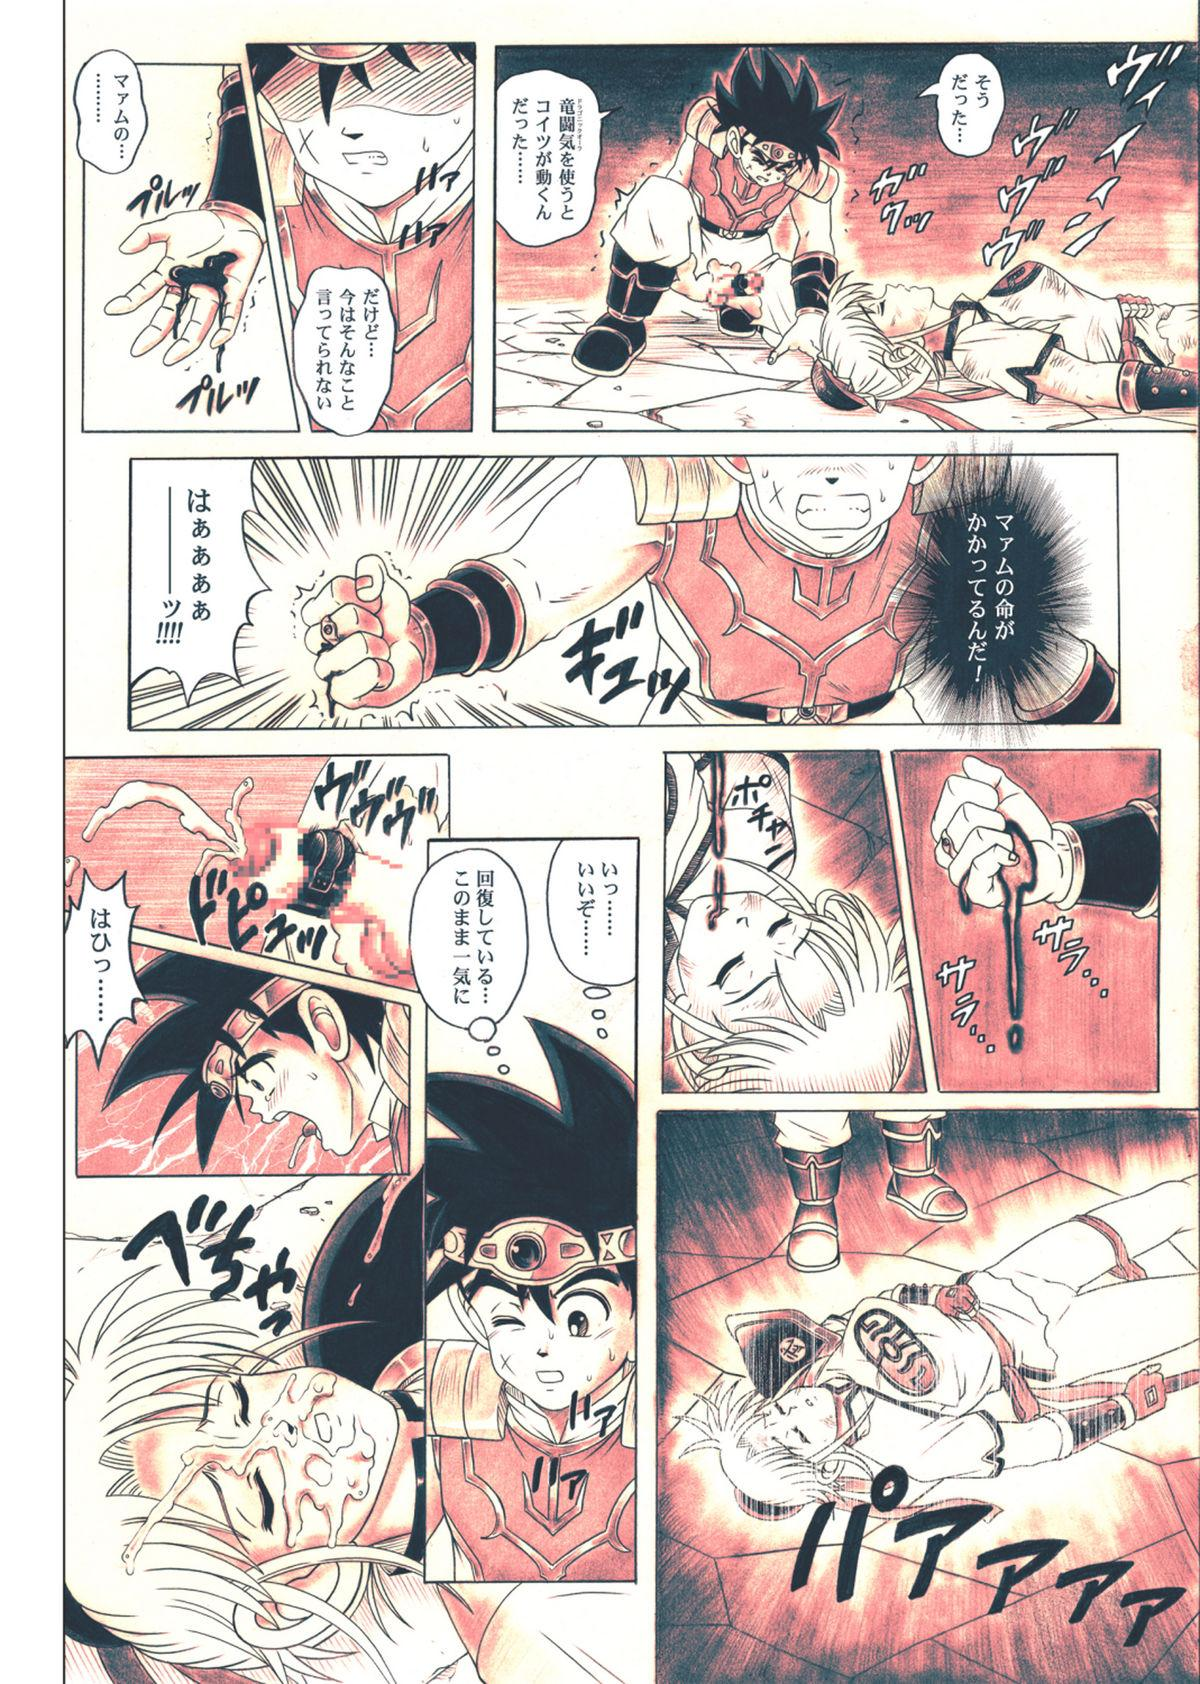 [Cyclone (Reizei, Izumi)] STAR TAC IDO ~Youkuso Haja no Doukutsu he~ Chuuhen Download edition (Dragon Warrior: Dai's Great Adventure) [Digital] 93